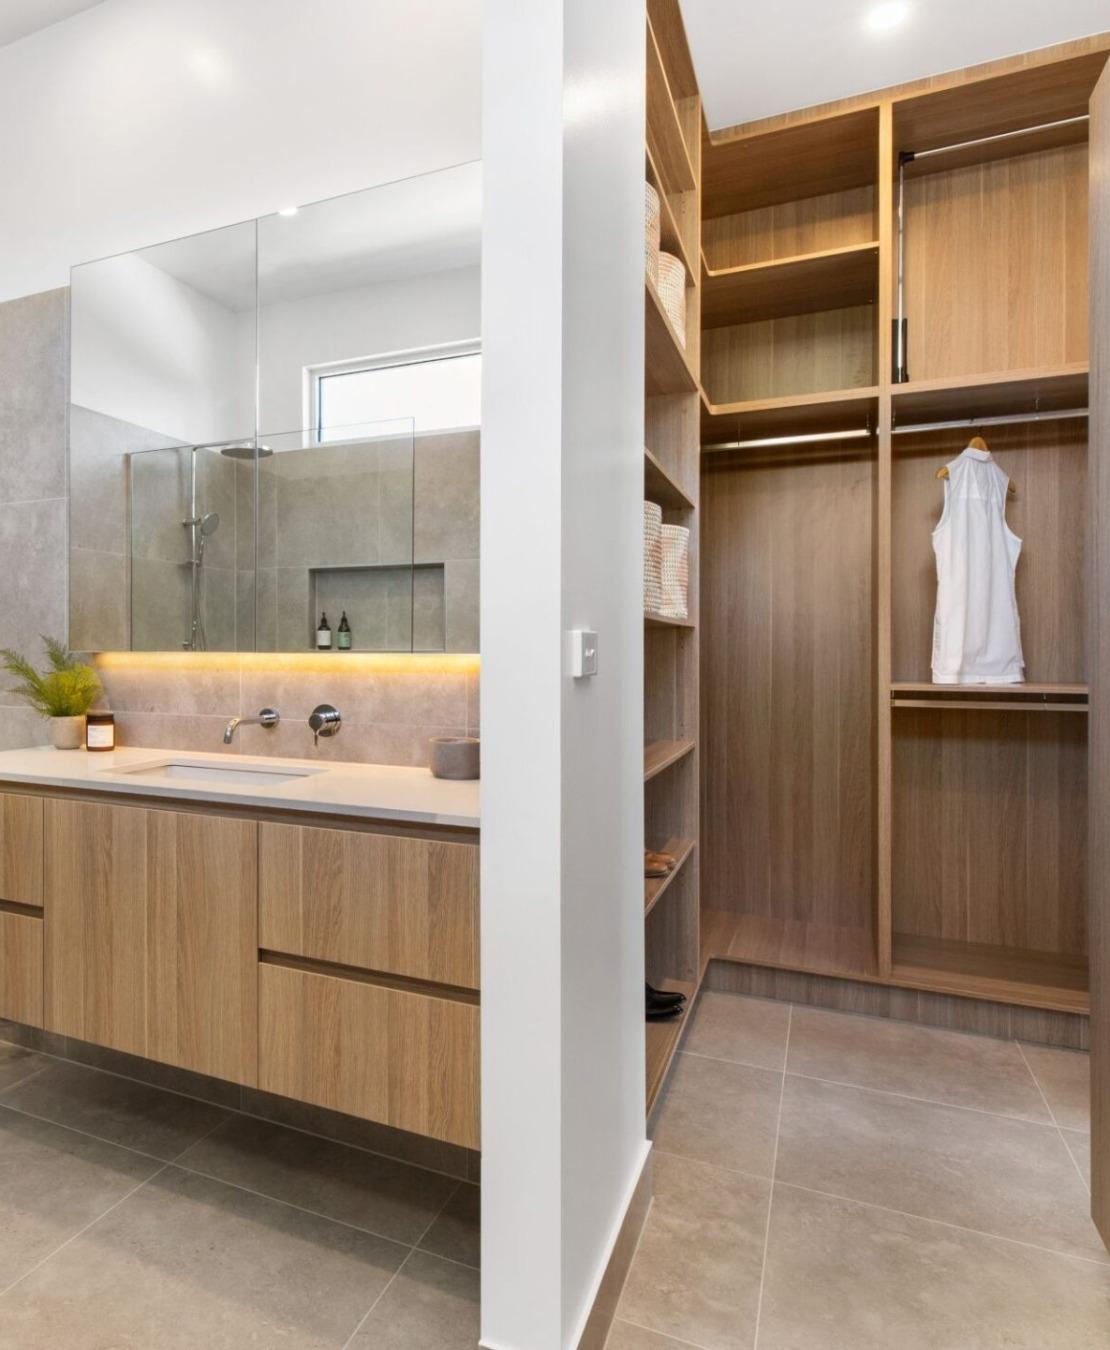 Cabinet Renovations - Bayview Renovations